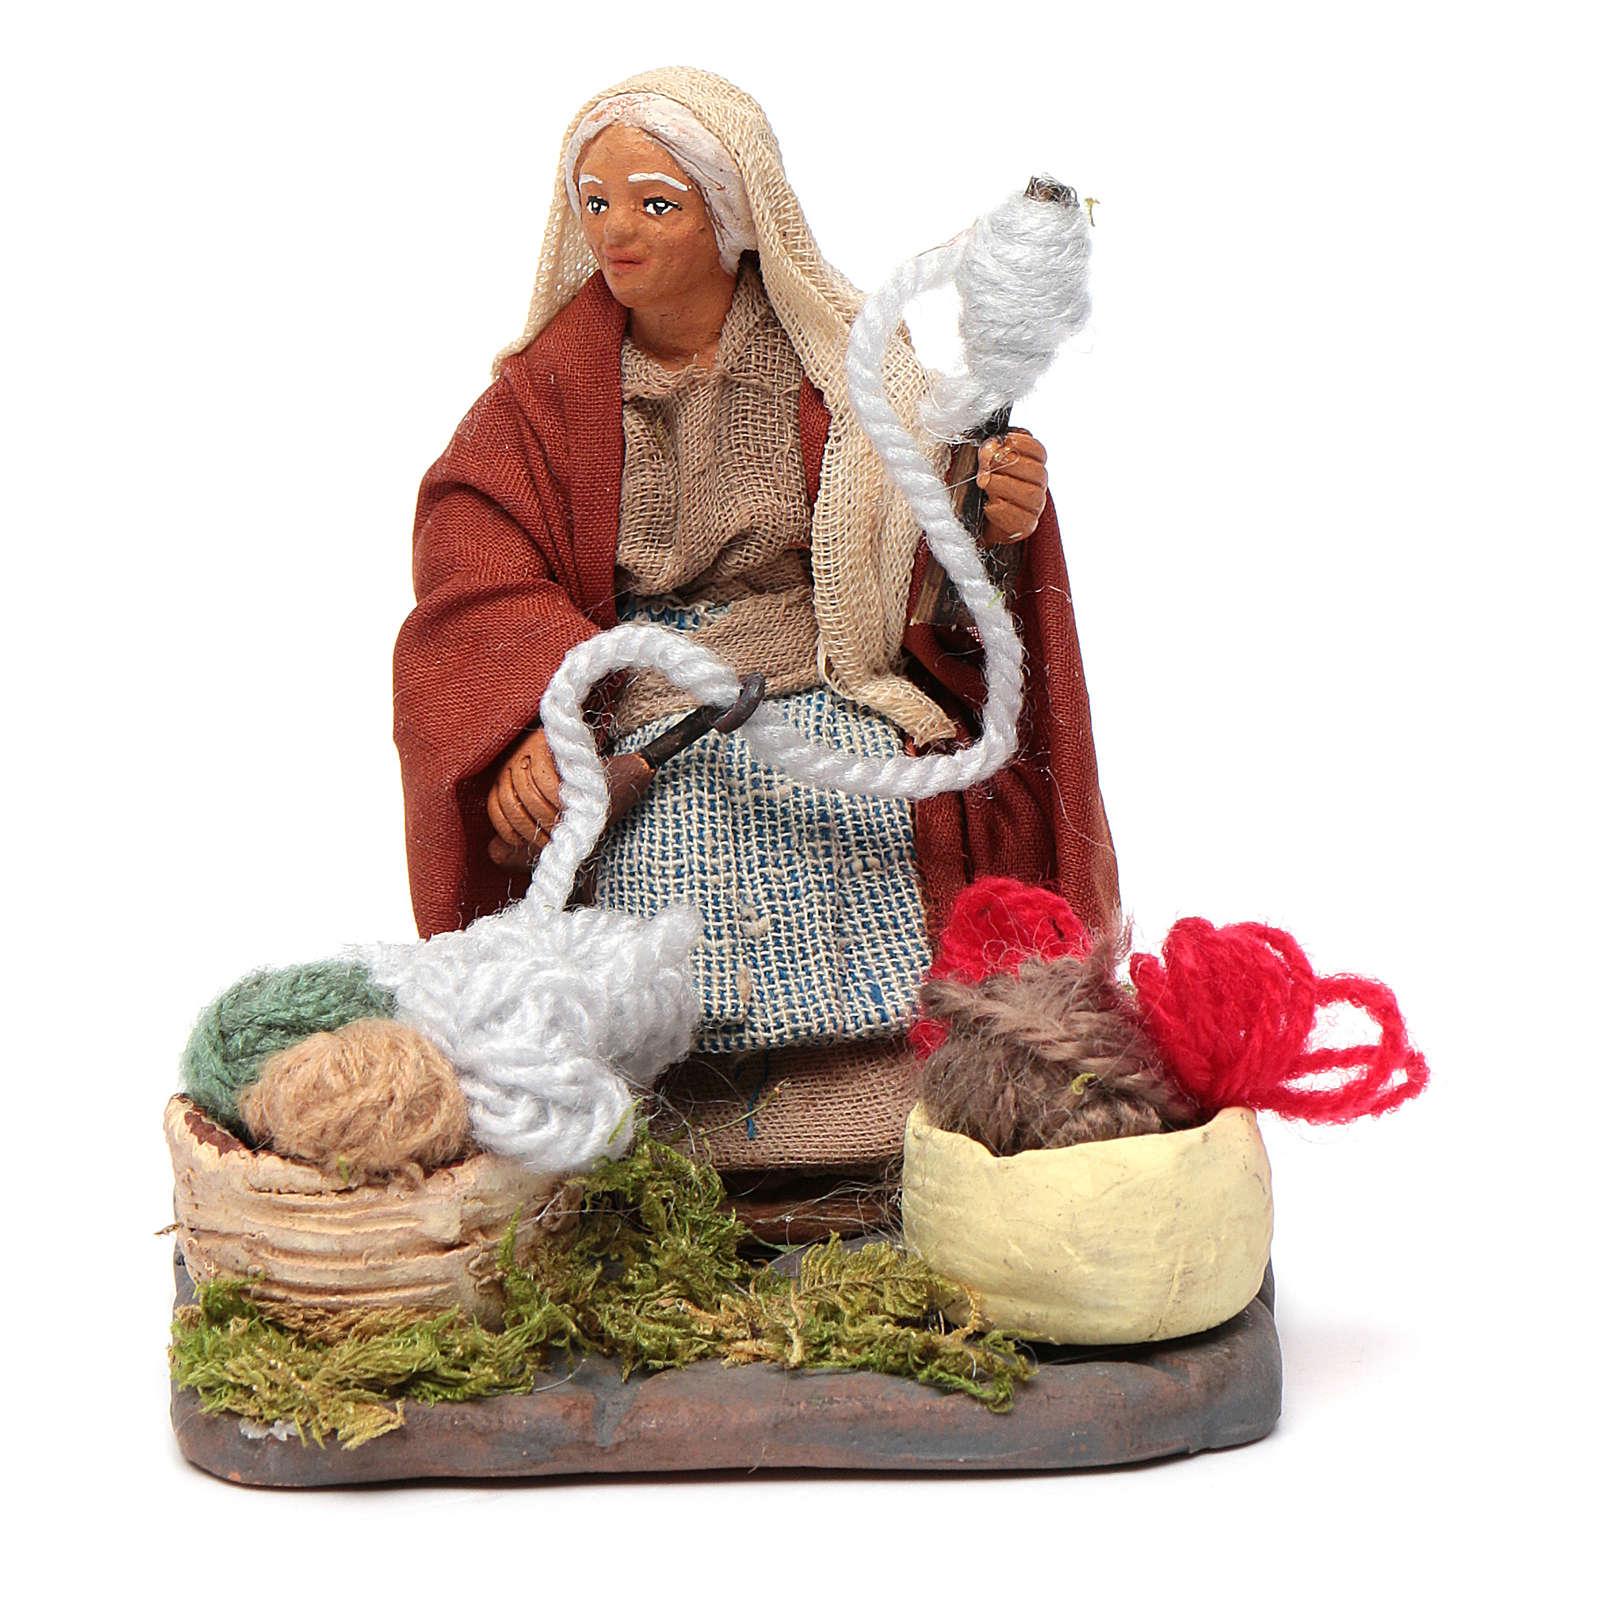 Woman spinning 10 cm for nativity scene 4